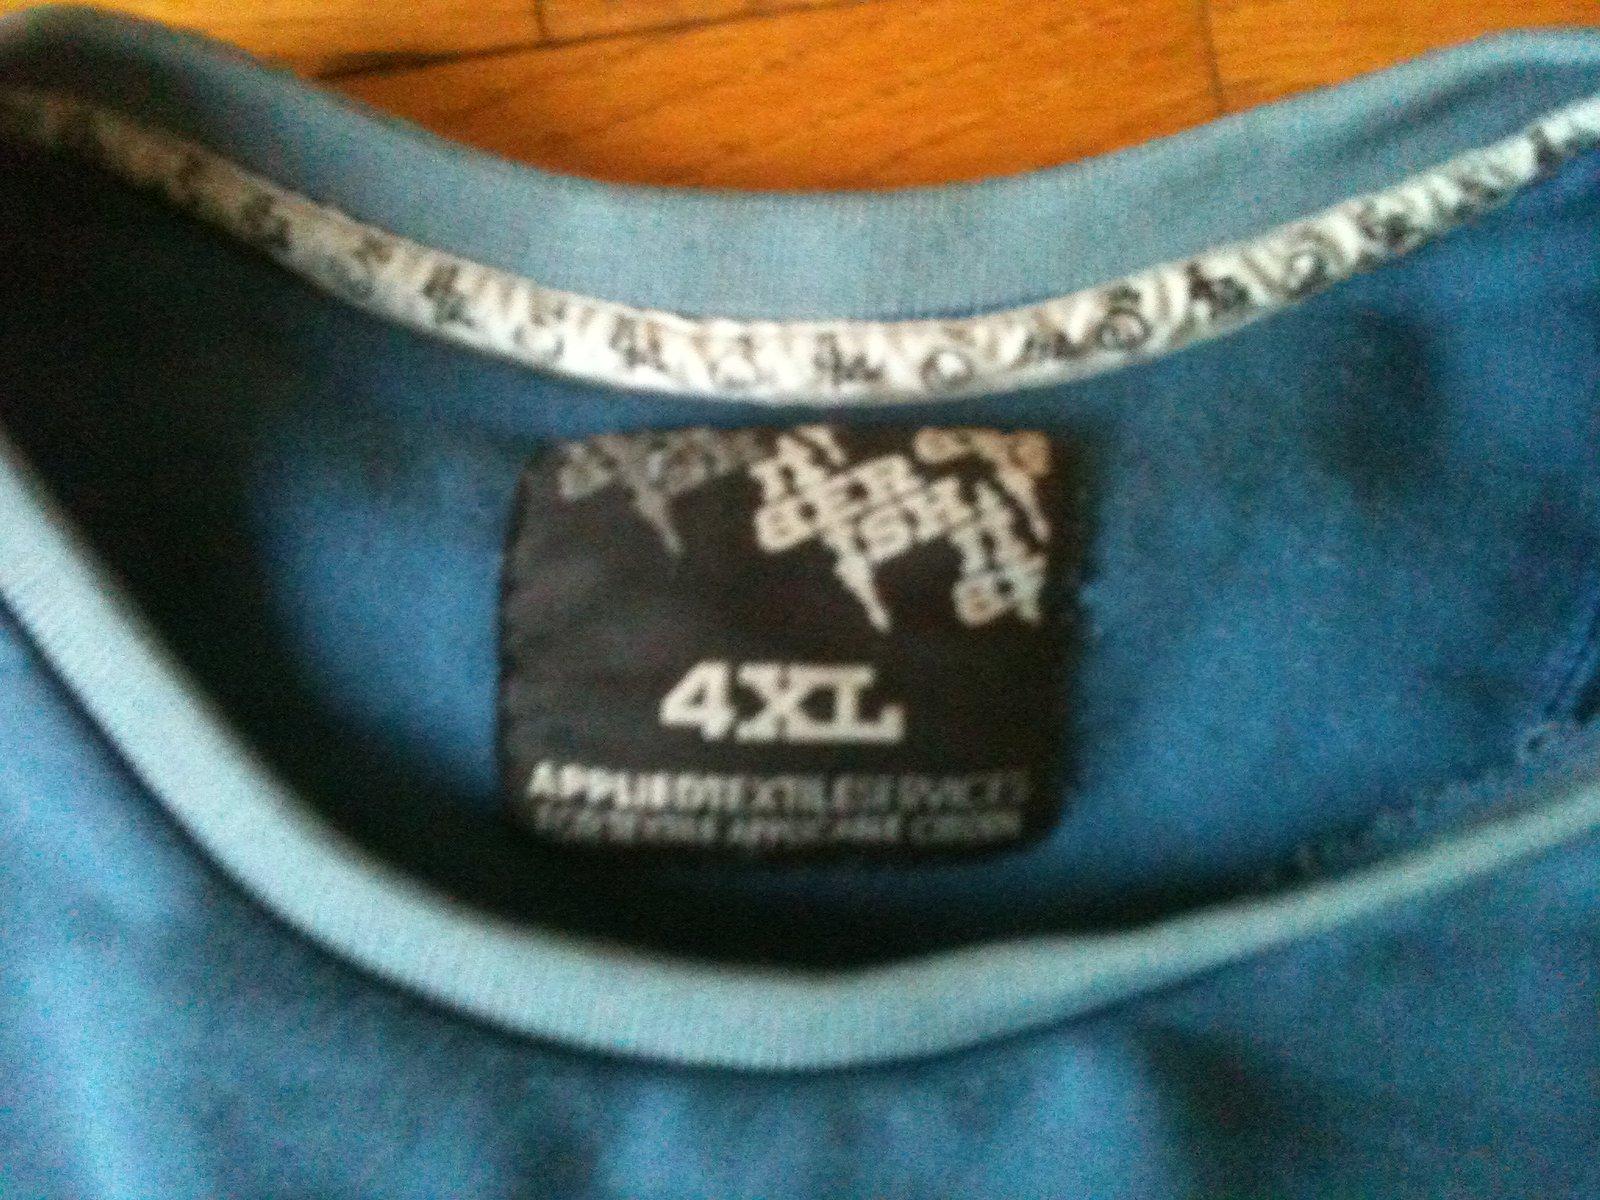 4xl 88 back blue